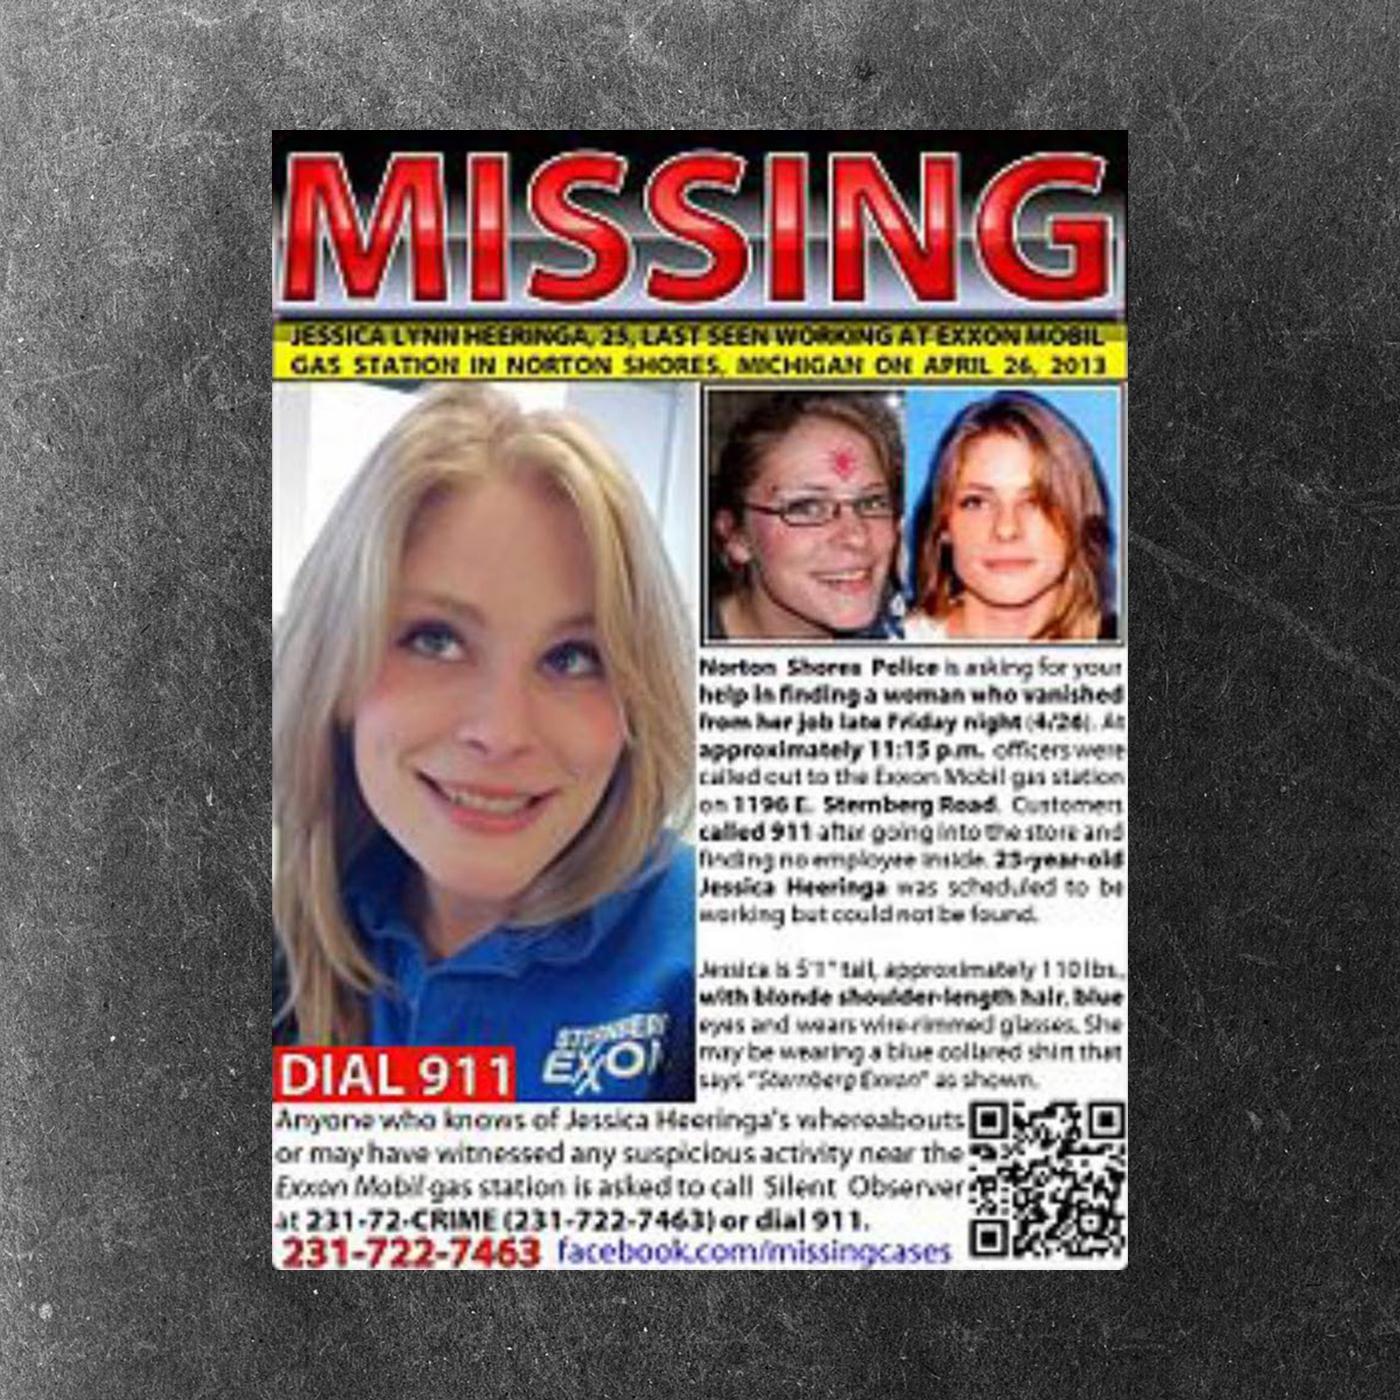 Jessica Heeringa missing poster